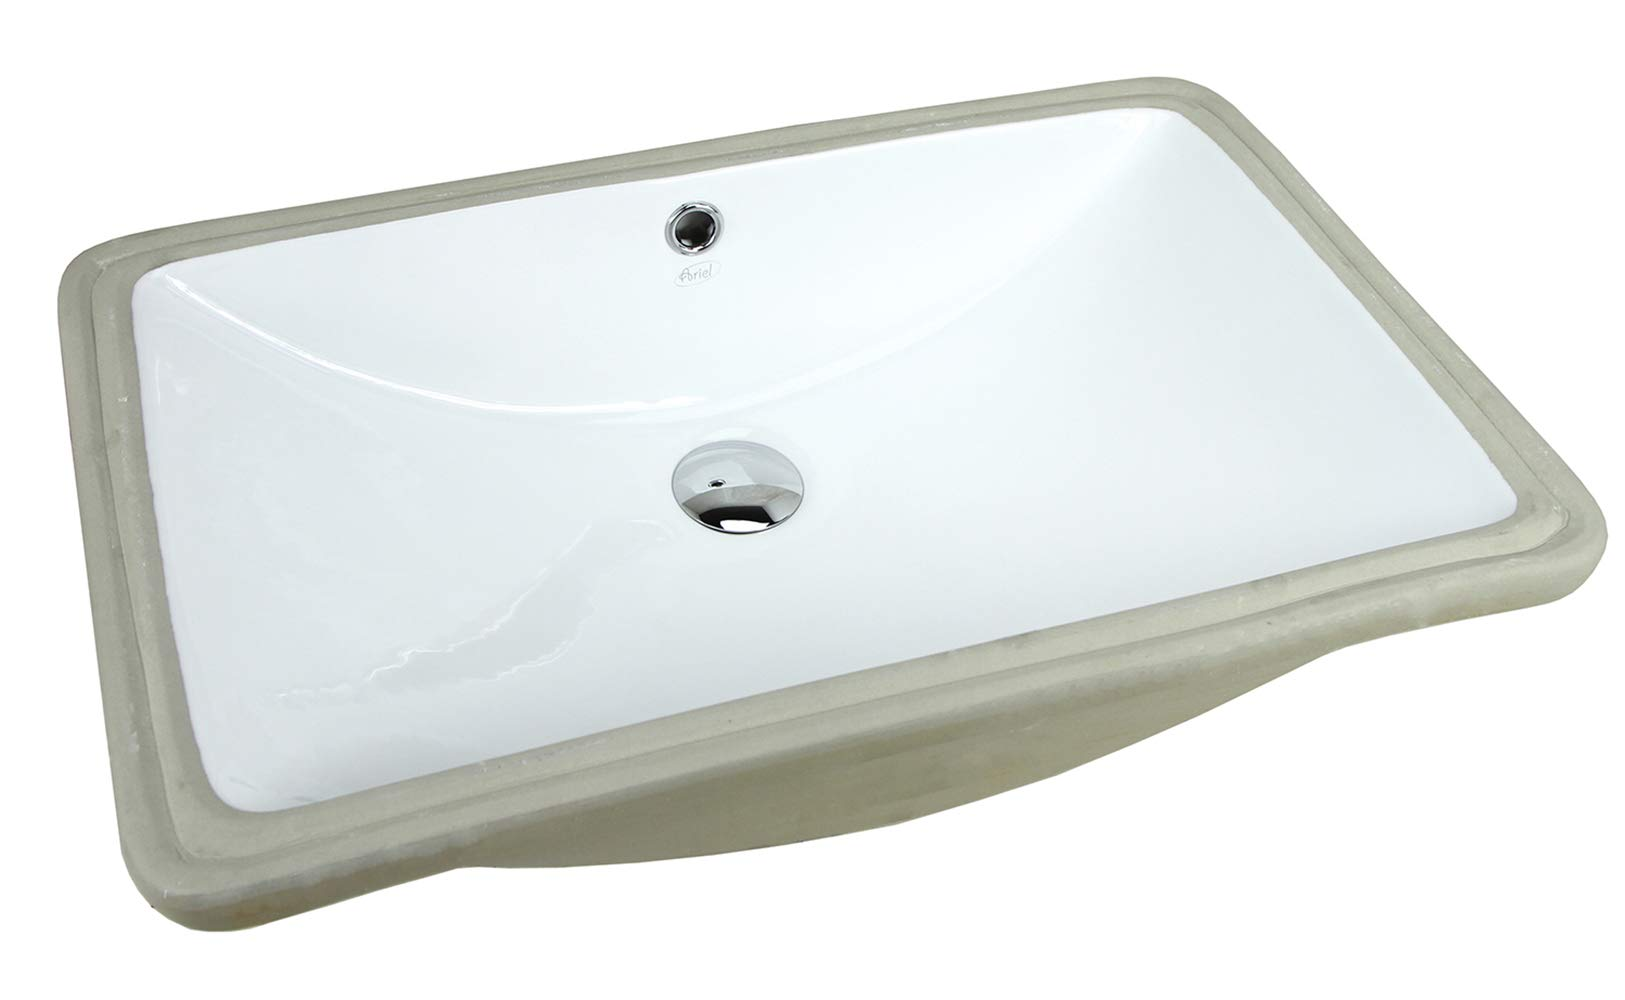 SUPER LARGE 24 Inch Rectrangle Undermount Vitreous Ceramic Lavatory Vanity Bathroom Sink Pure White RP492P